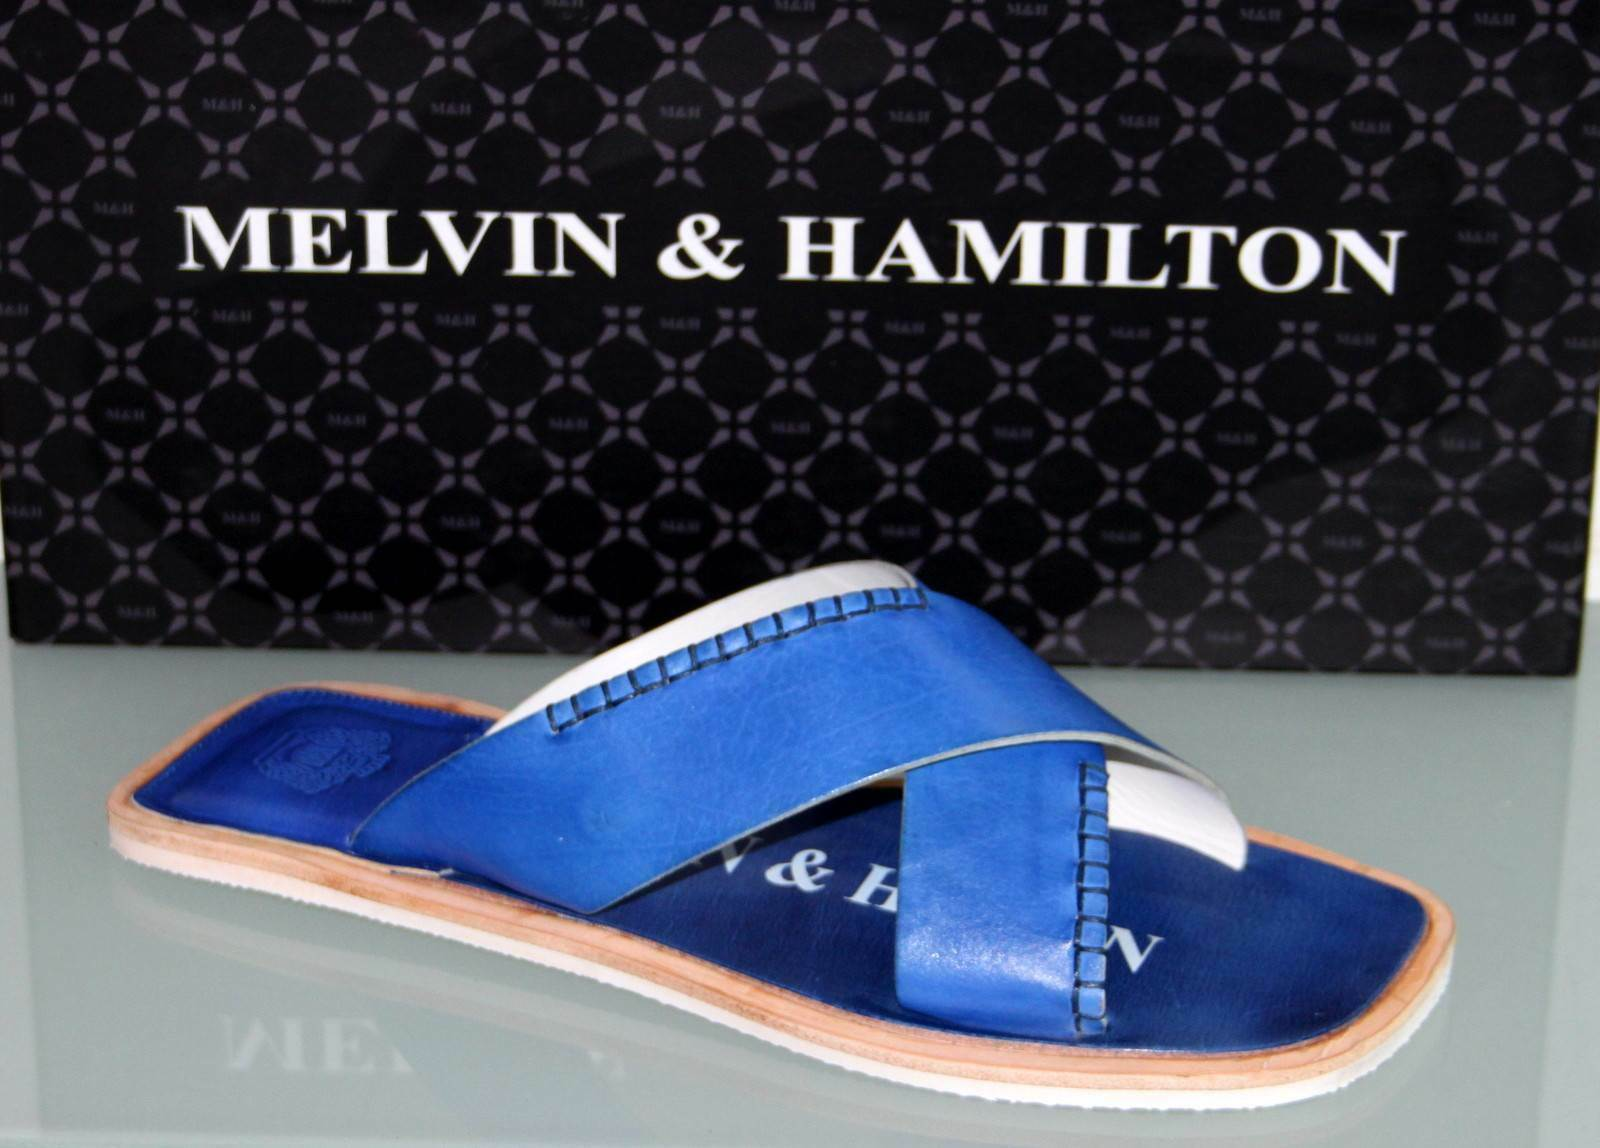 MELVIN & HAMILTON Leder Schlappe Sandale - BOB 1 Electric Blau - Neu&Original